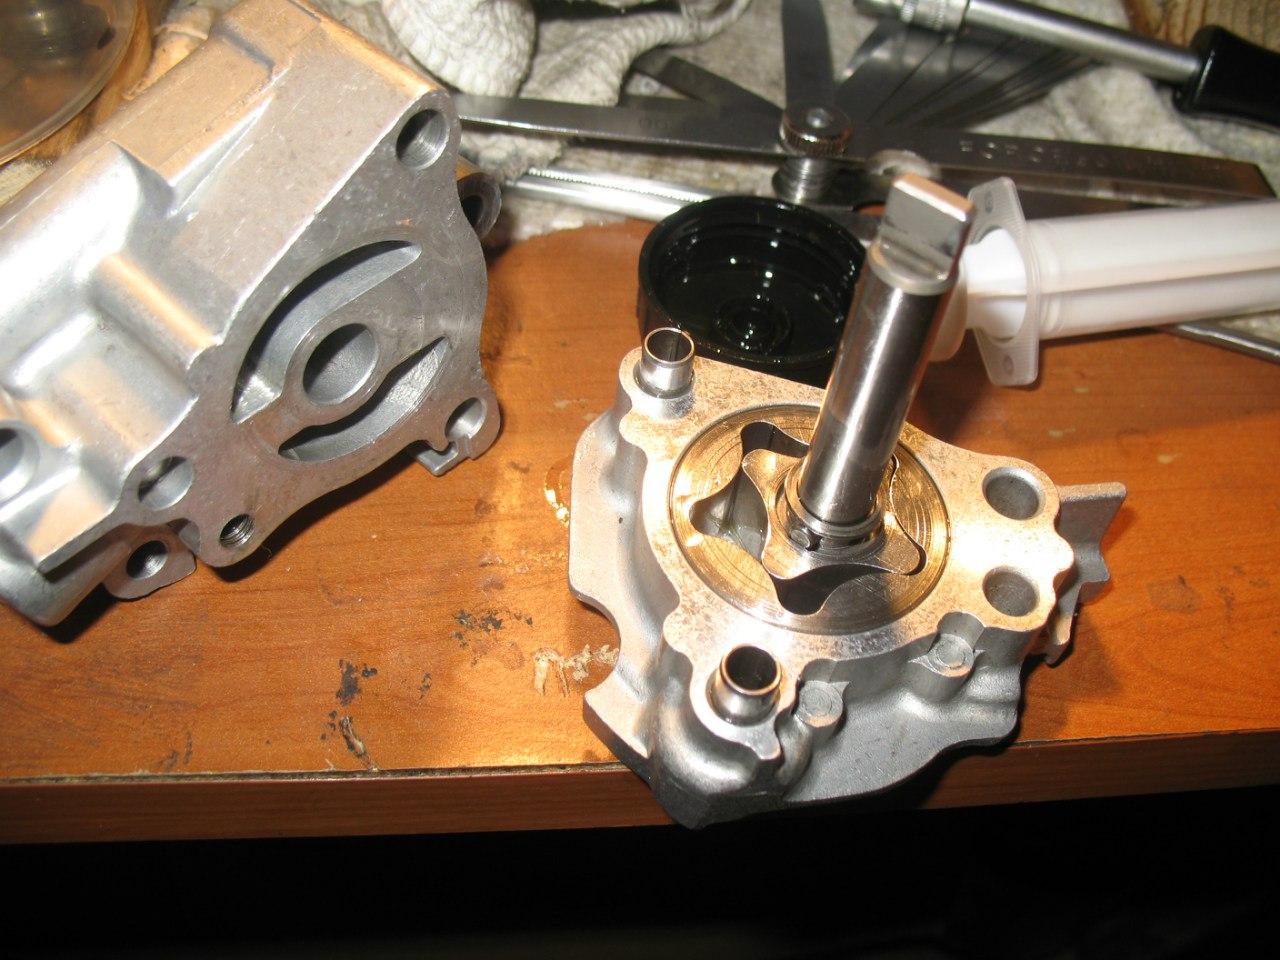 Блог им. Mrak2: Разборка-сборка мотора 2001 Honda XL650V1 Transalp